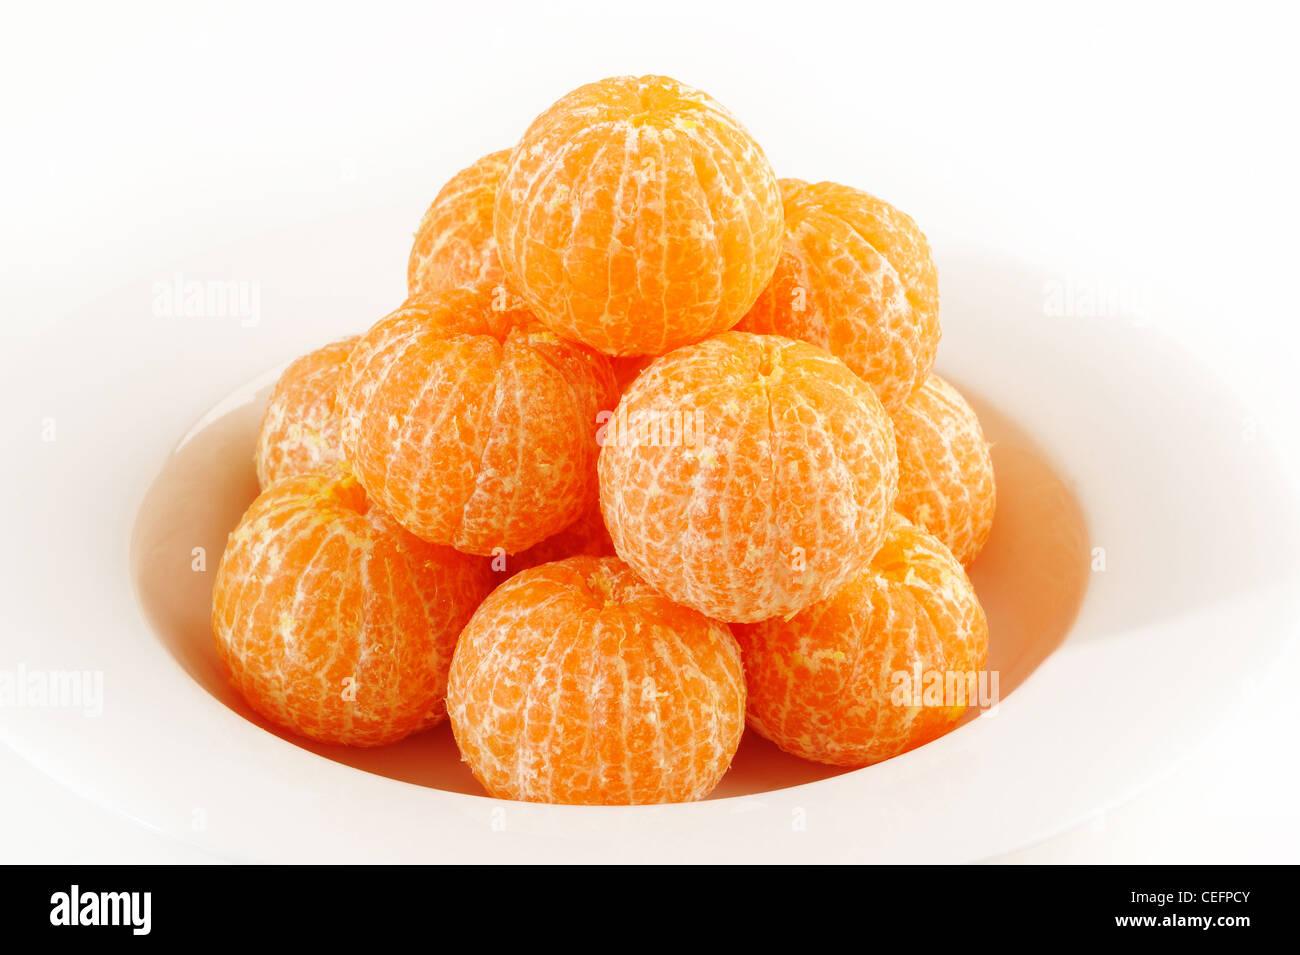 Mandarin orange on white dish - Stock Image